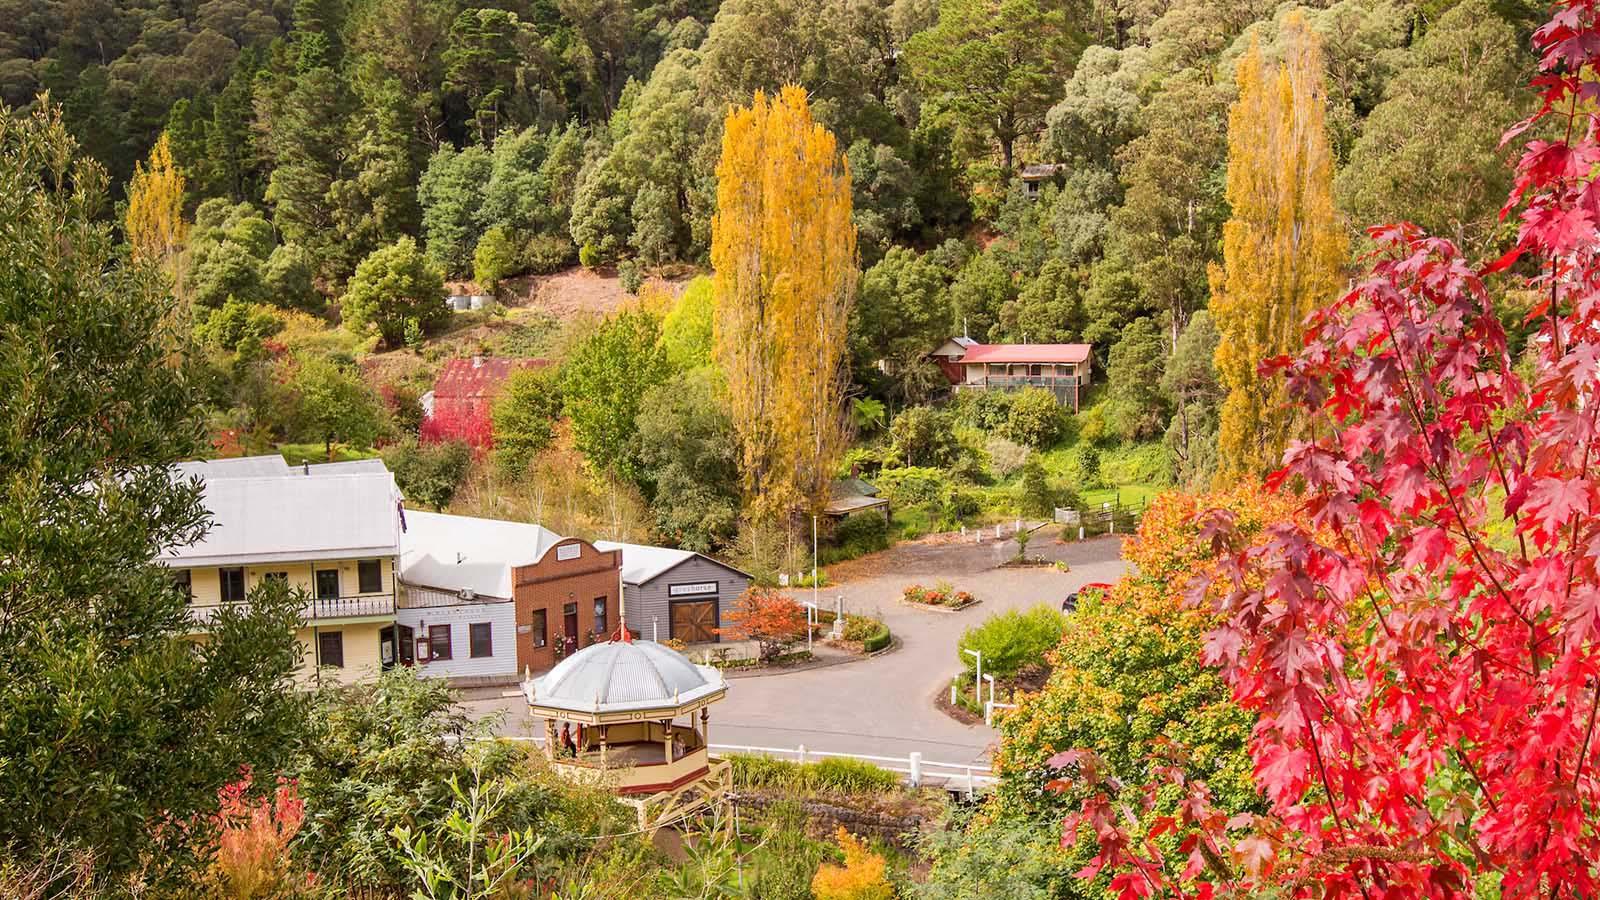 Walhalla, Gippsland, Victoria, Australia